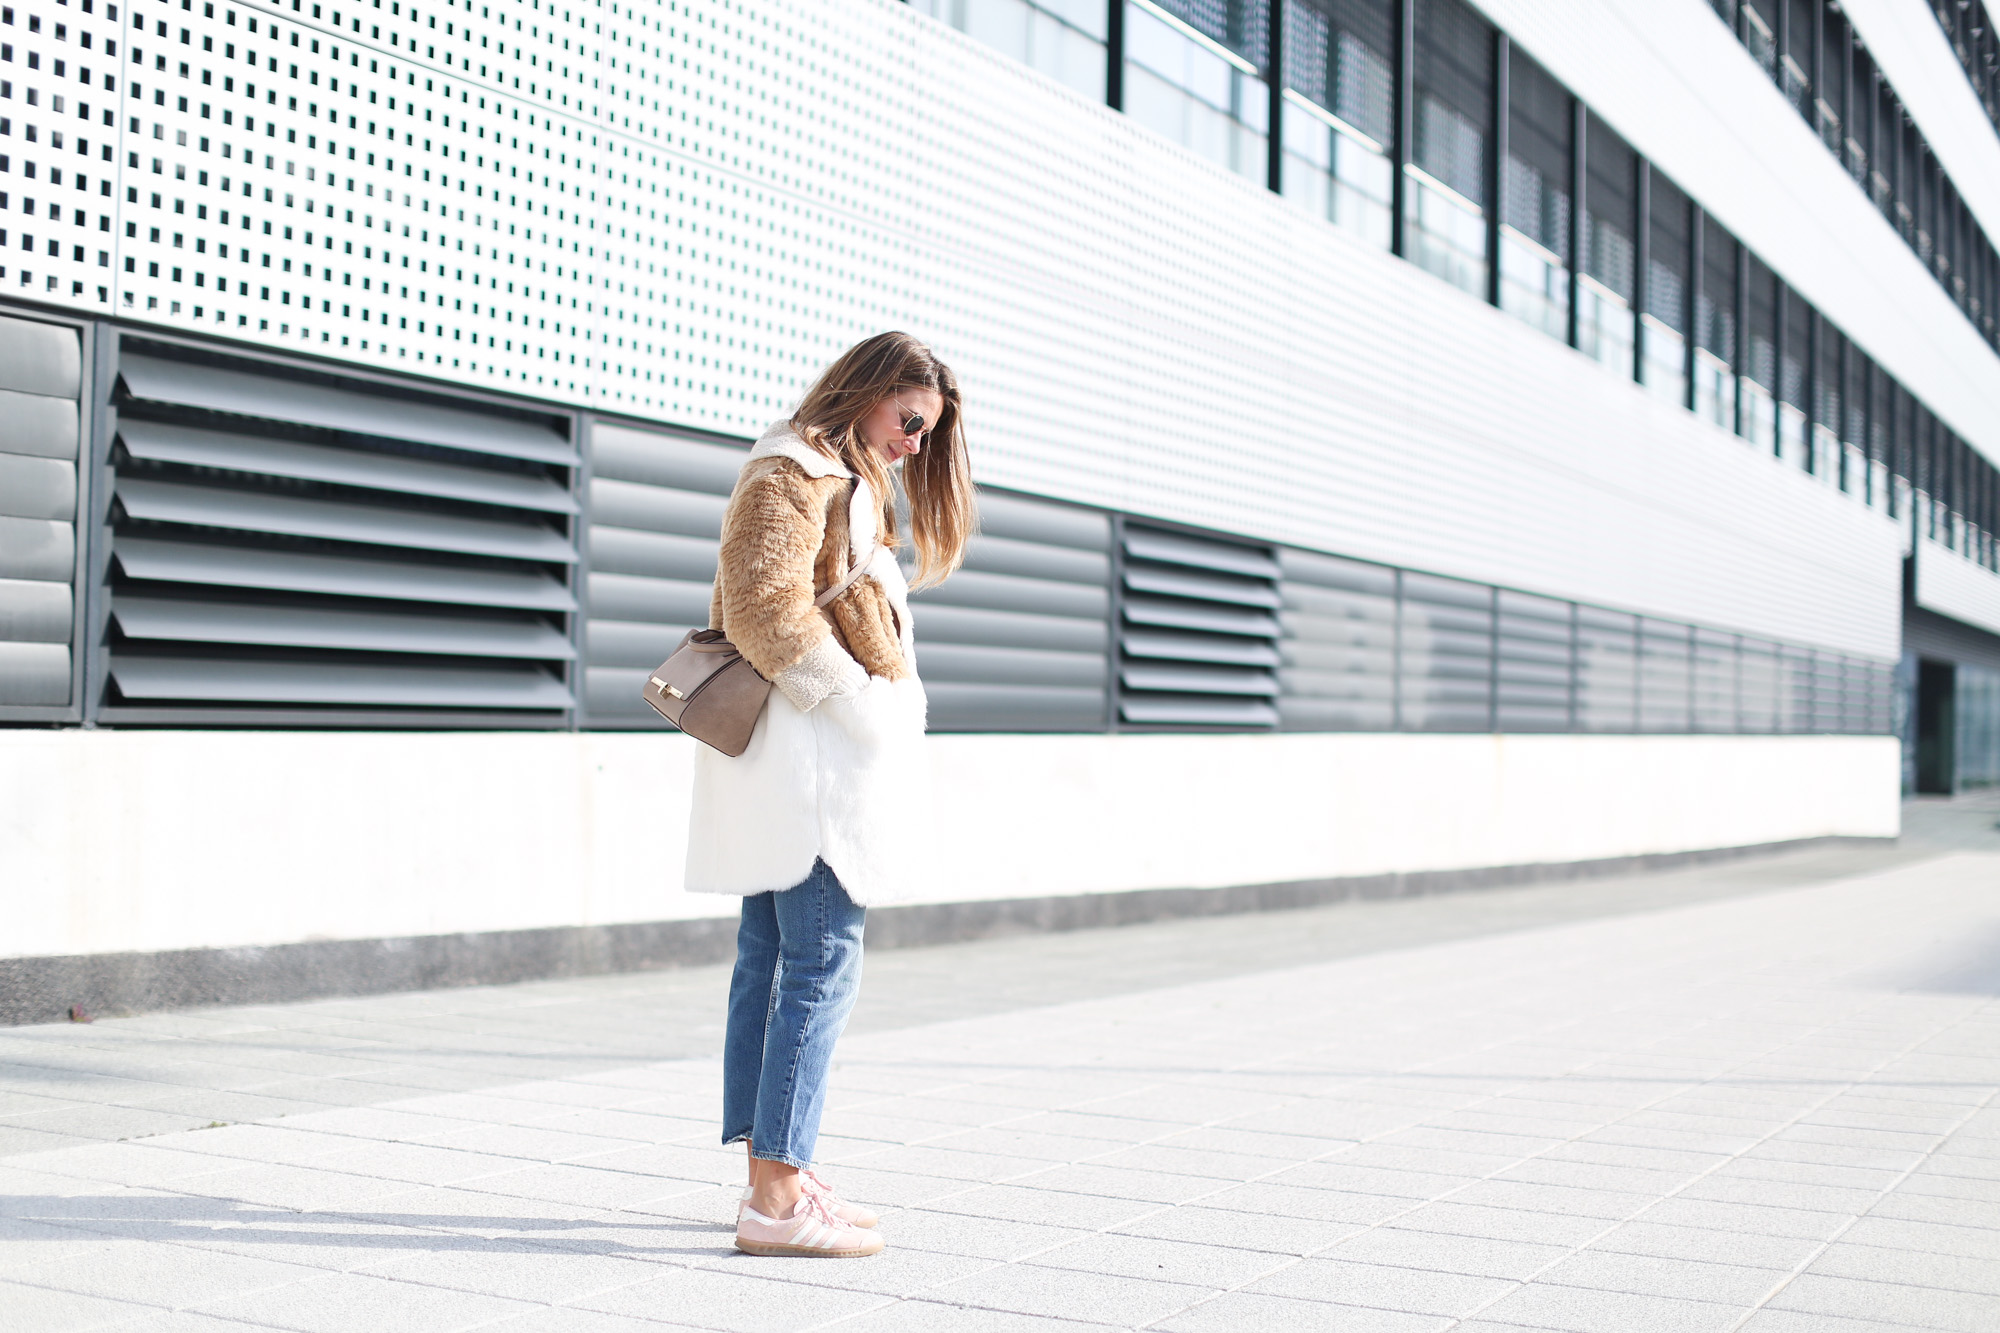 Clochet_streetstyle_fashionblogger_asosfauxfurteddycoat_pinkadidashamburg_leztinstreet_acnestudiosjeans_pop-2